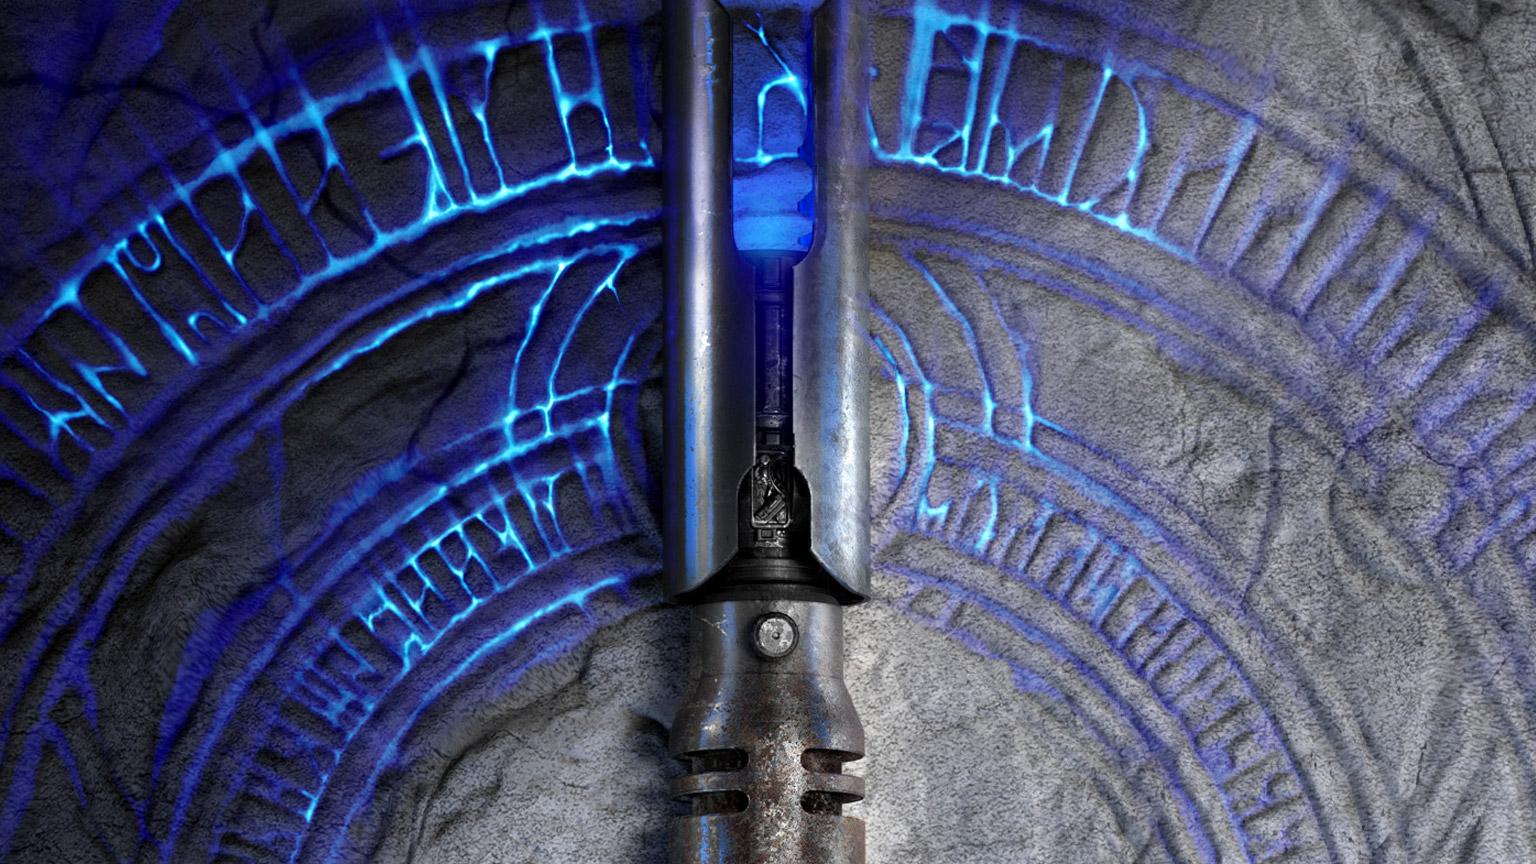 star-wars-jedi-fallen-order-usara-unreal-engine-4-frikigamers.com